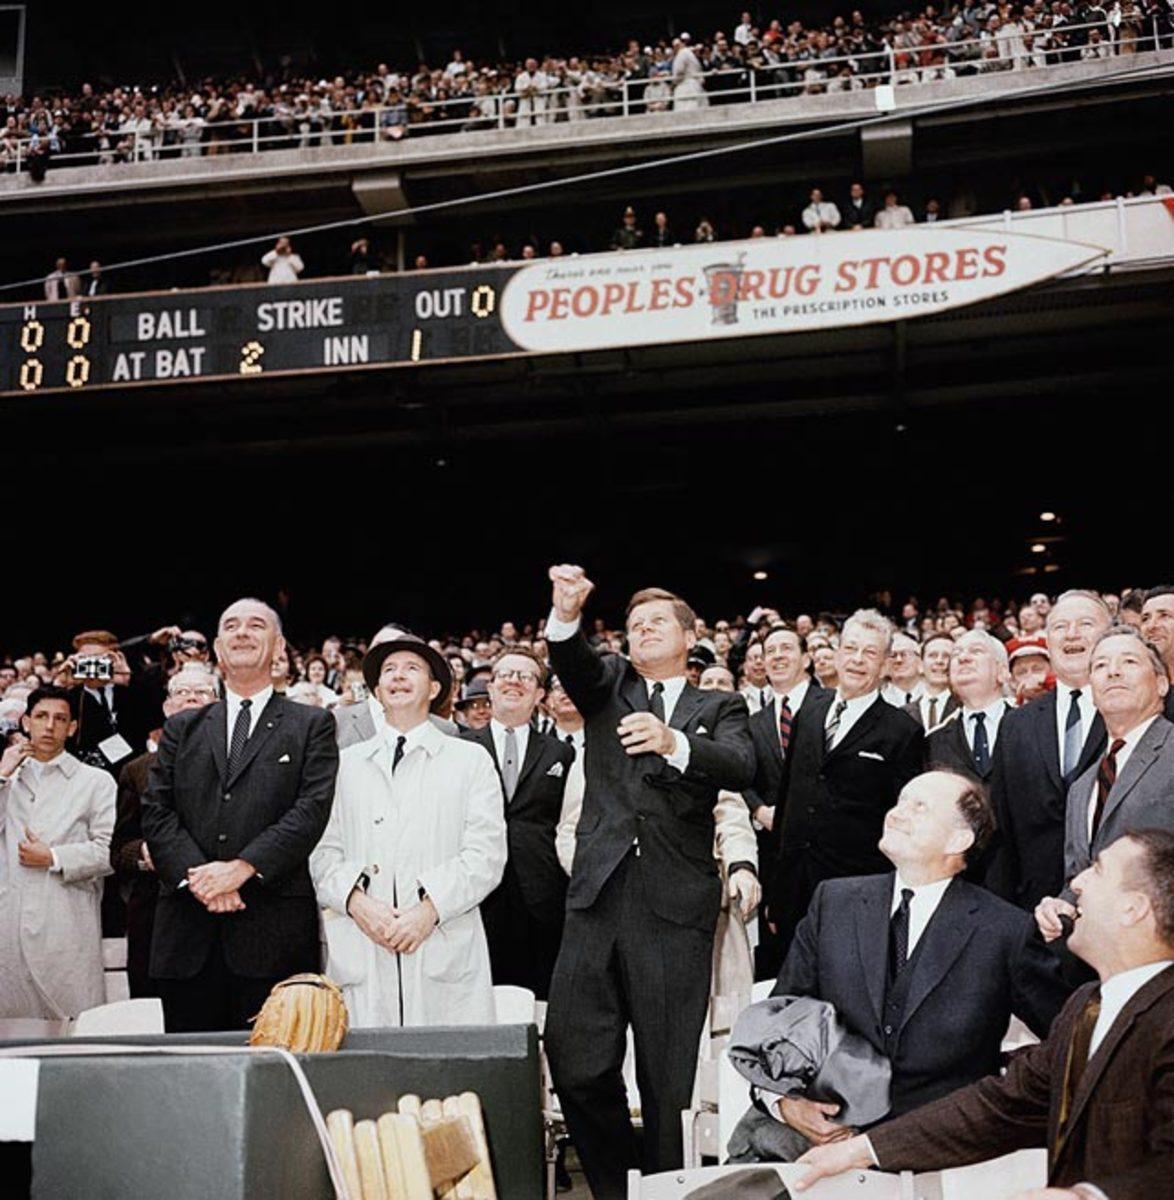 131121180927-1962-john-f-kennedy-senators-tigers-single-image-cut.jpg